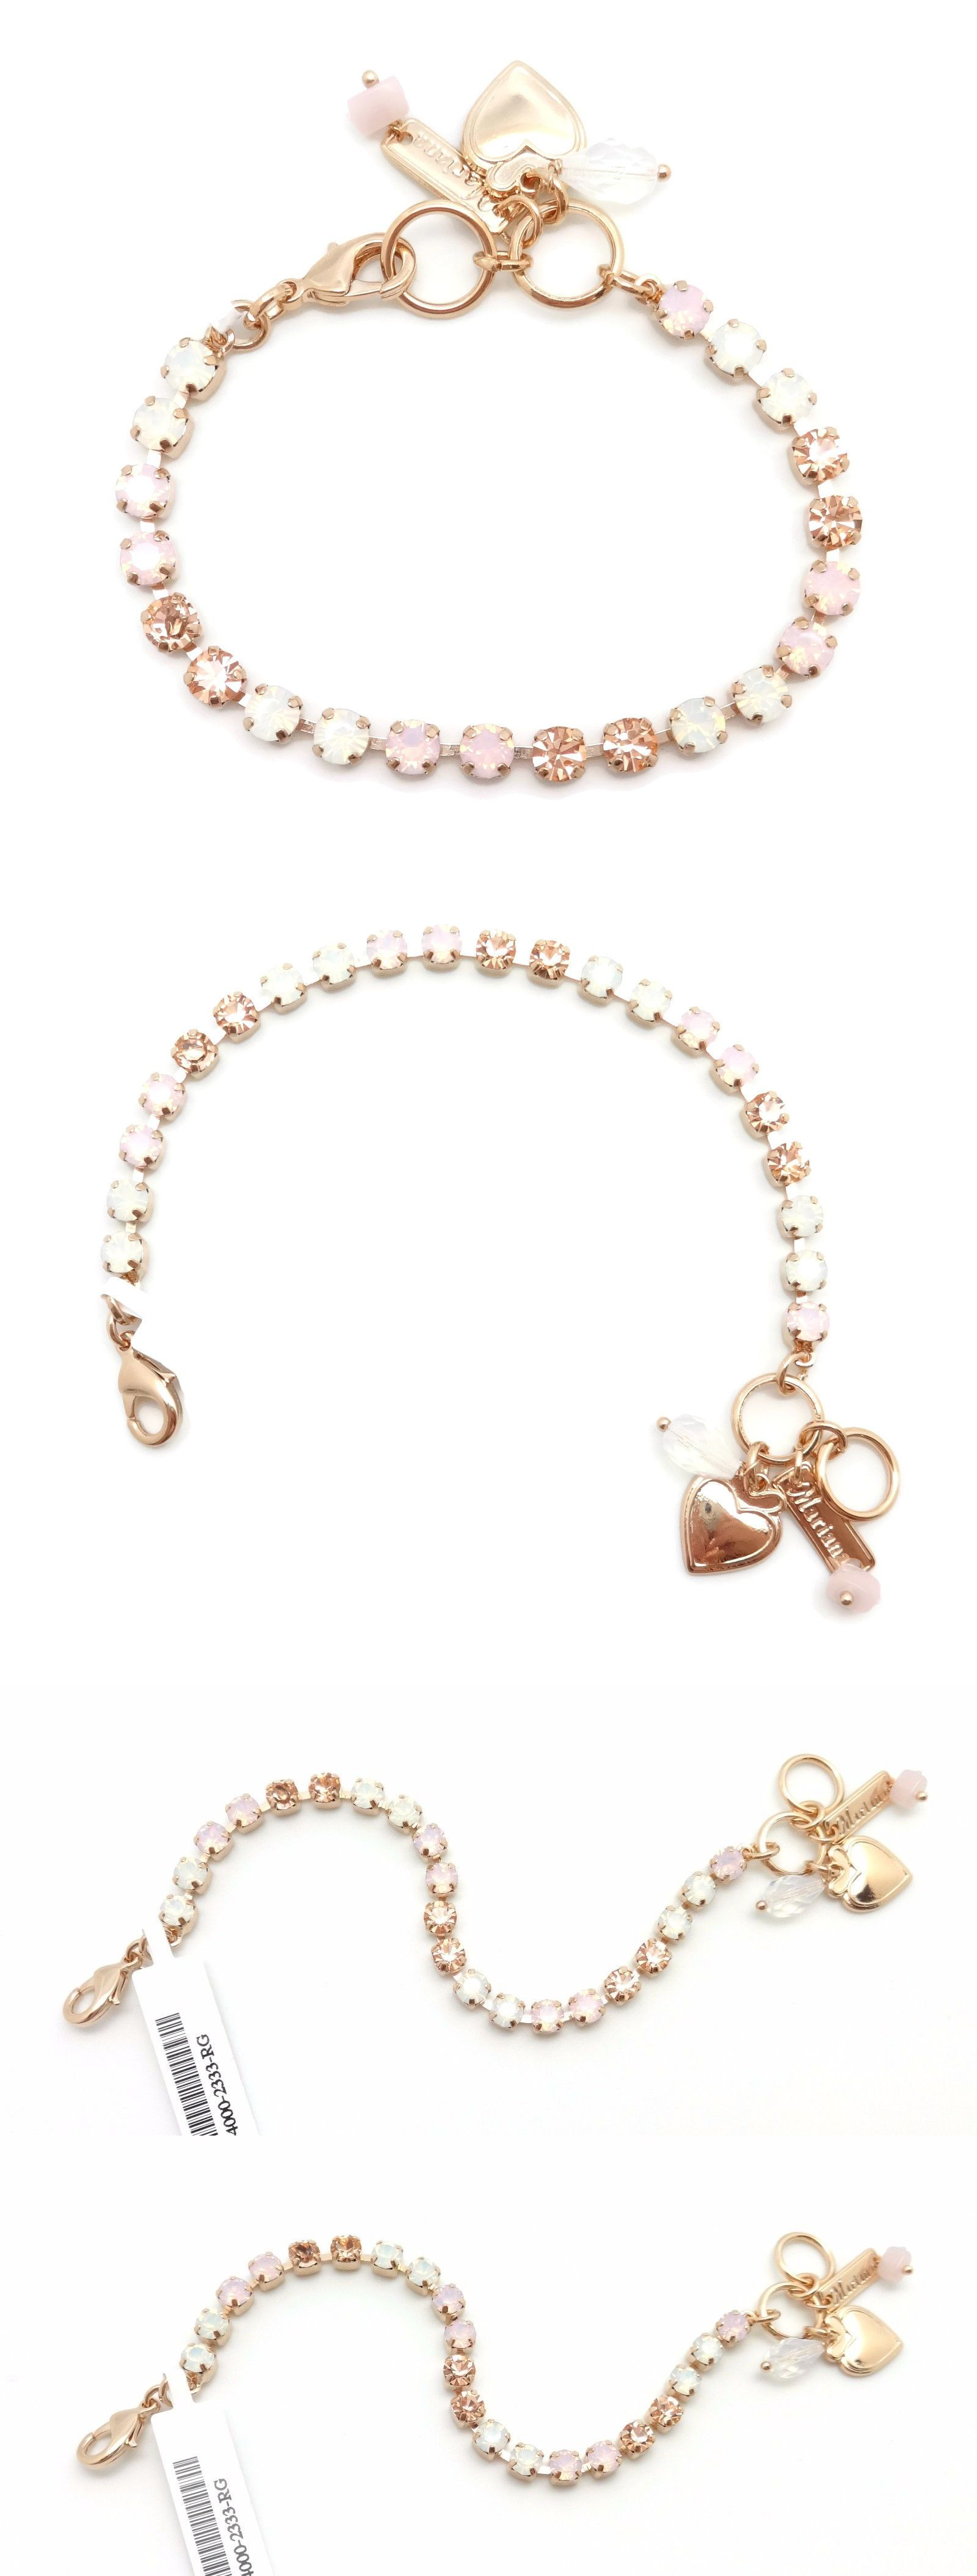 Bracelets mariana rose gold swarovski bracelet rosewater and